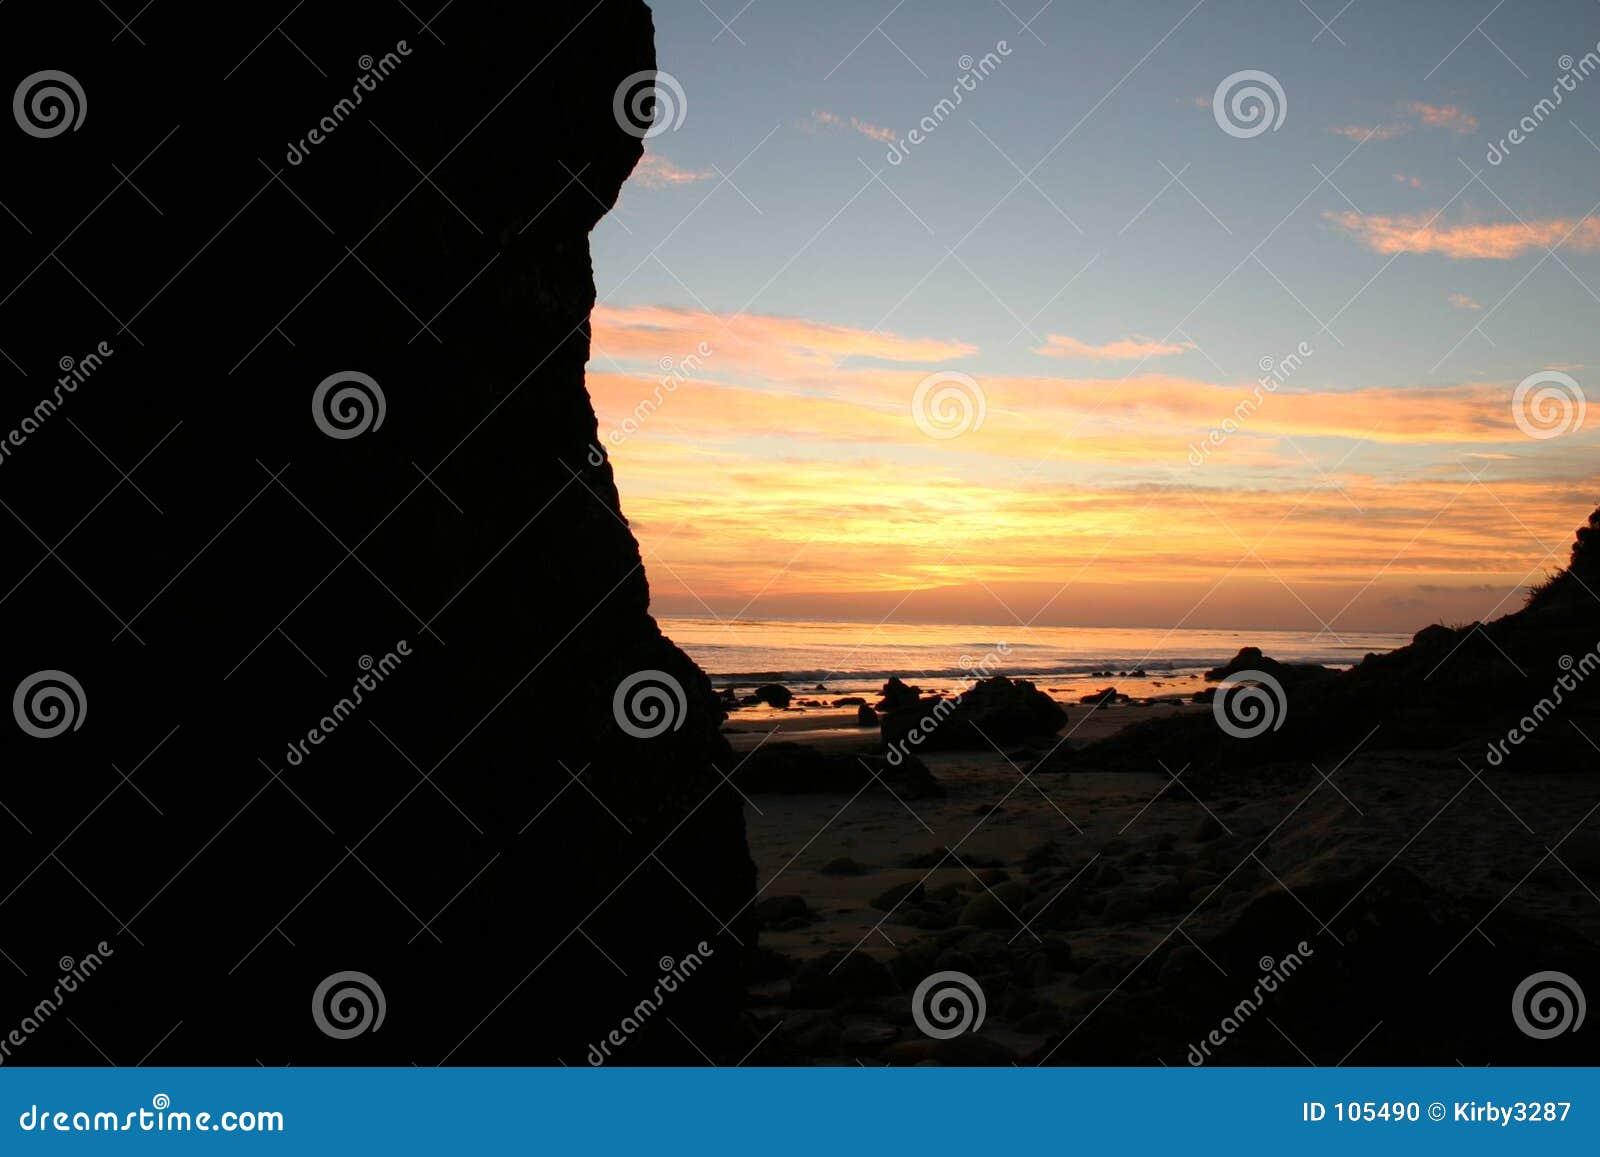 Am Sonnenuntergang